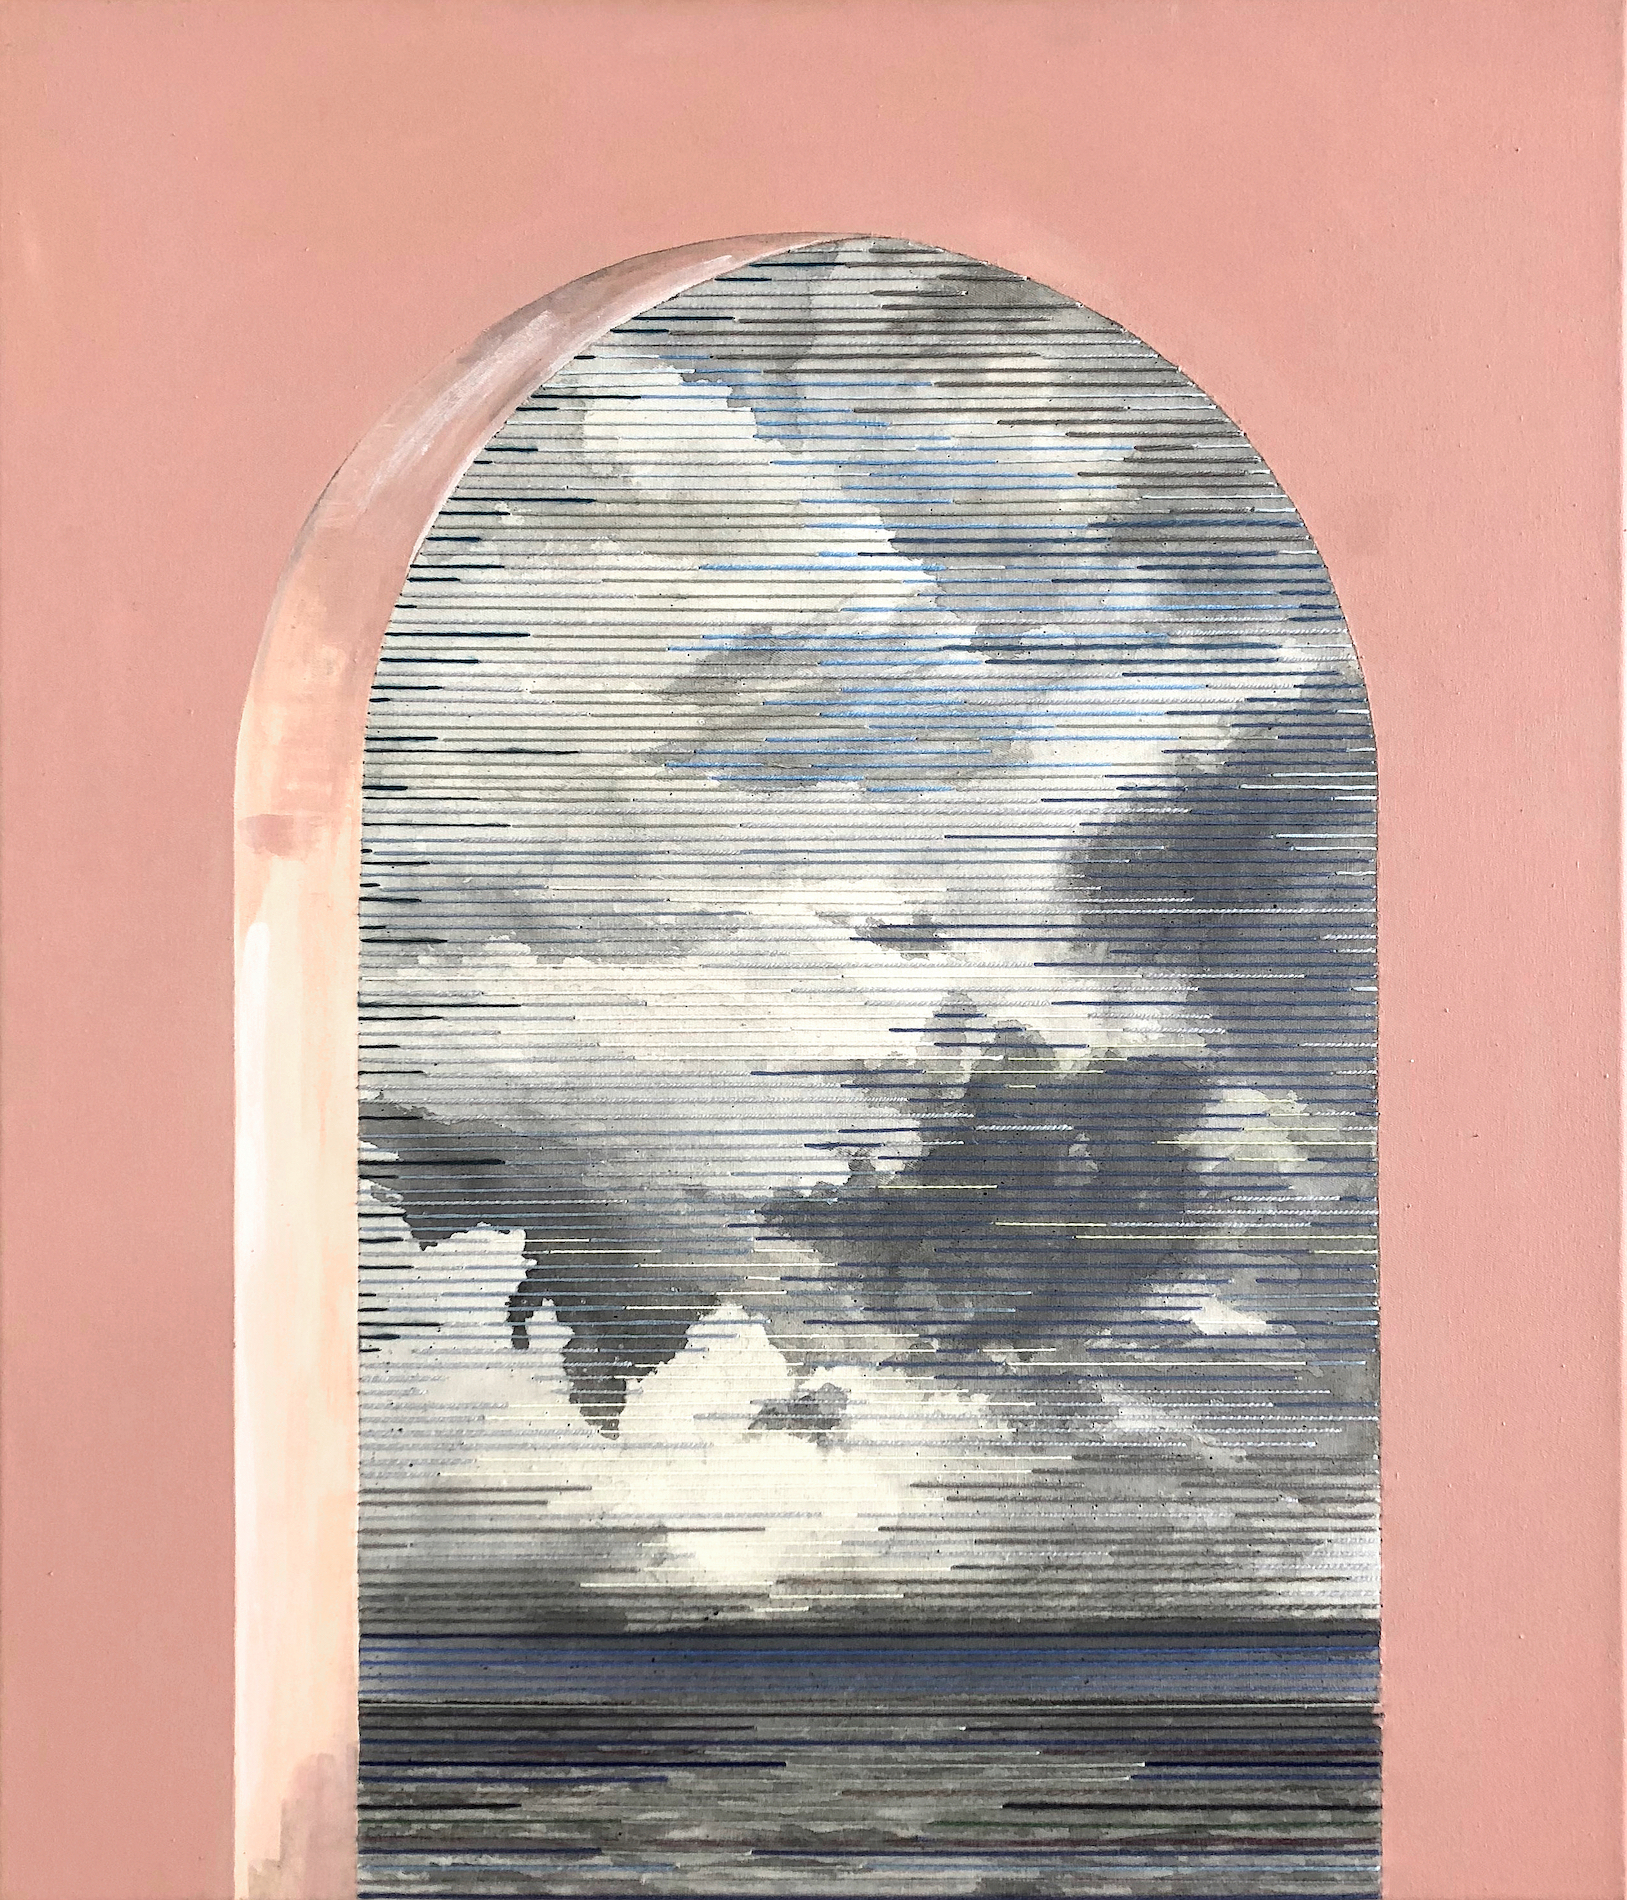 Linda Männel: Muralla roja 2019, Tusche/Garn auf Leinwand/Acrylfarbe, 60 x 70 cm